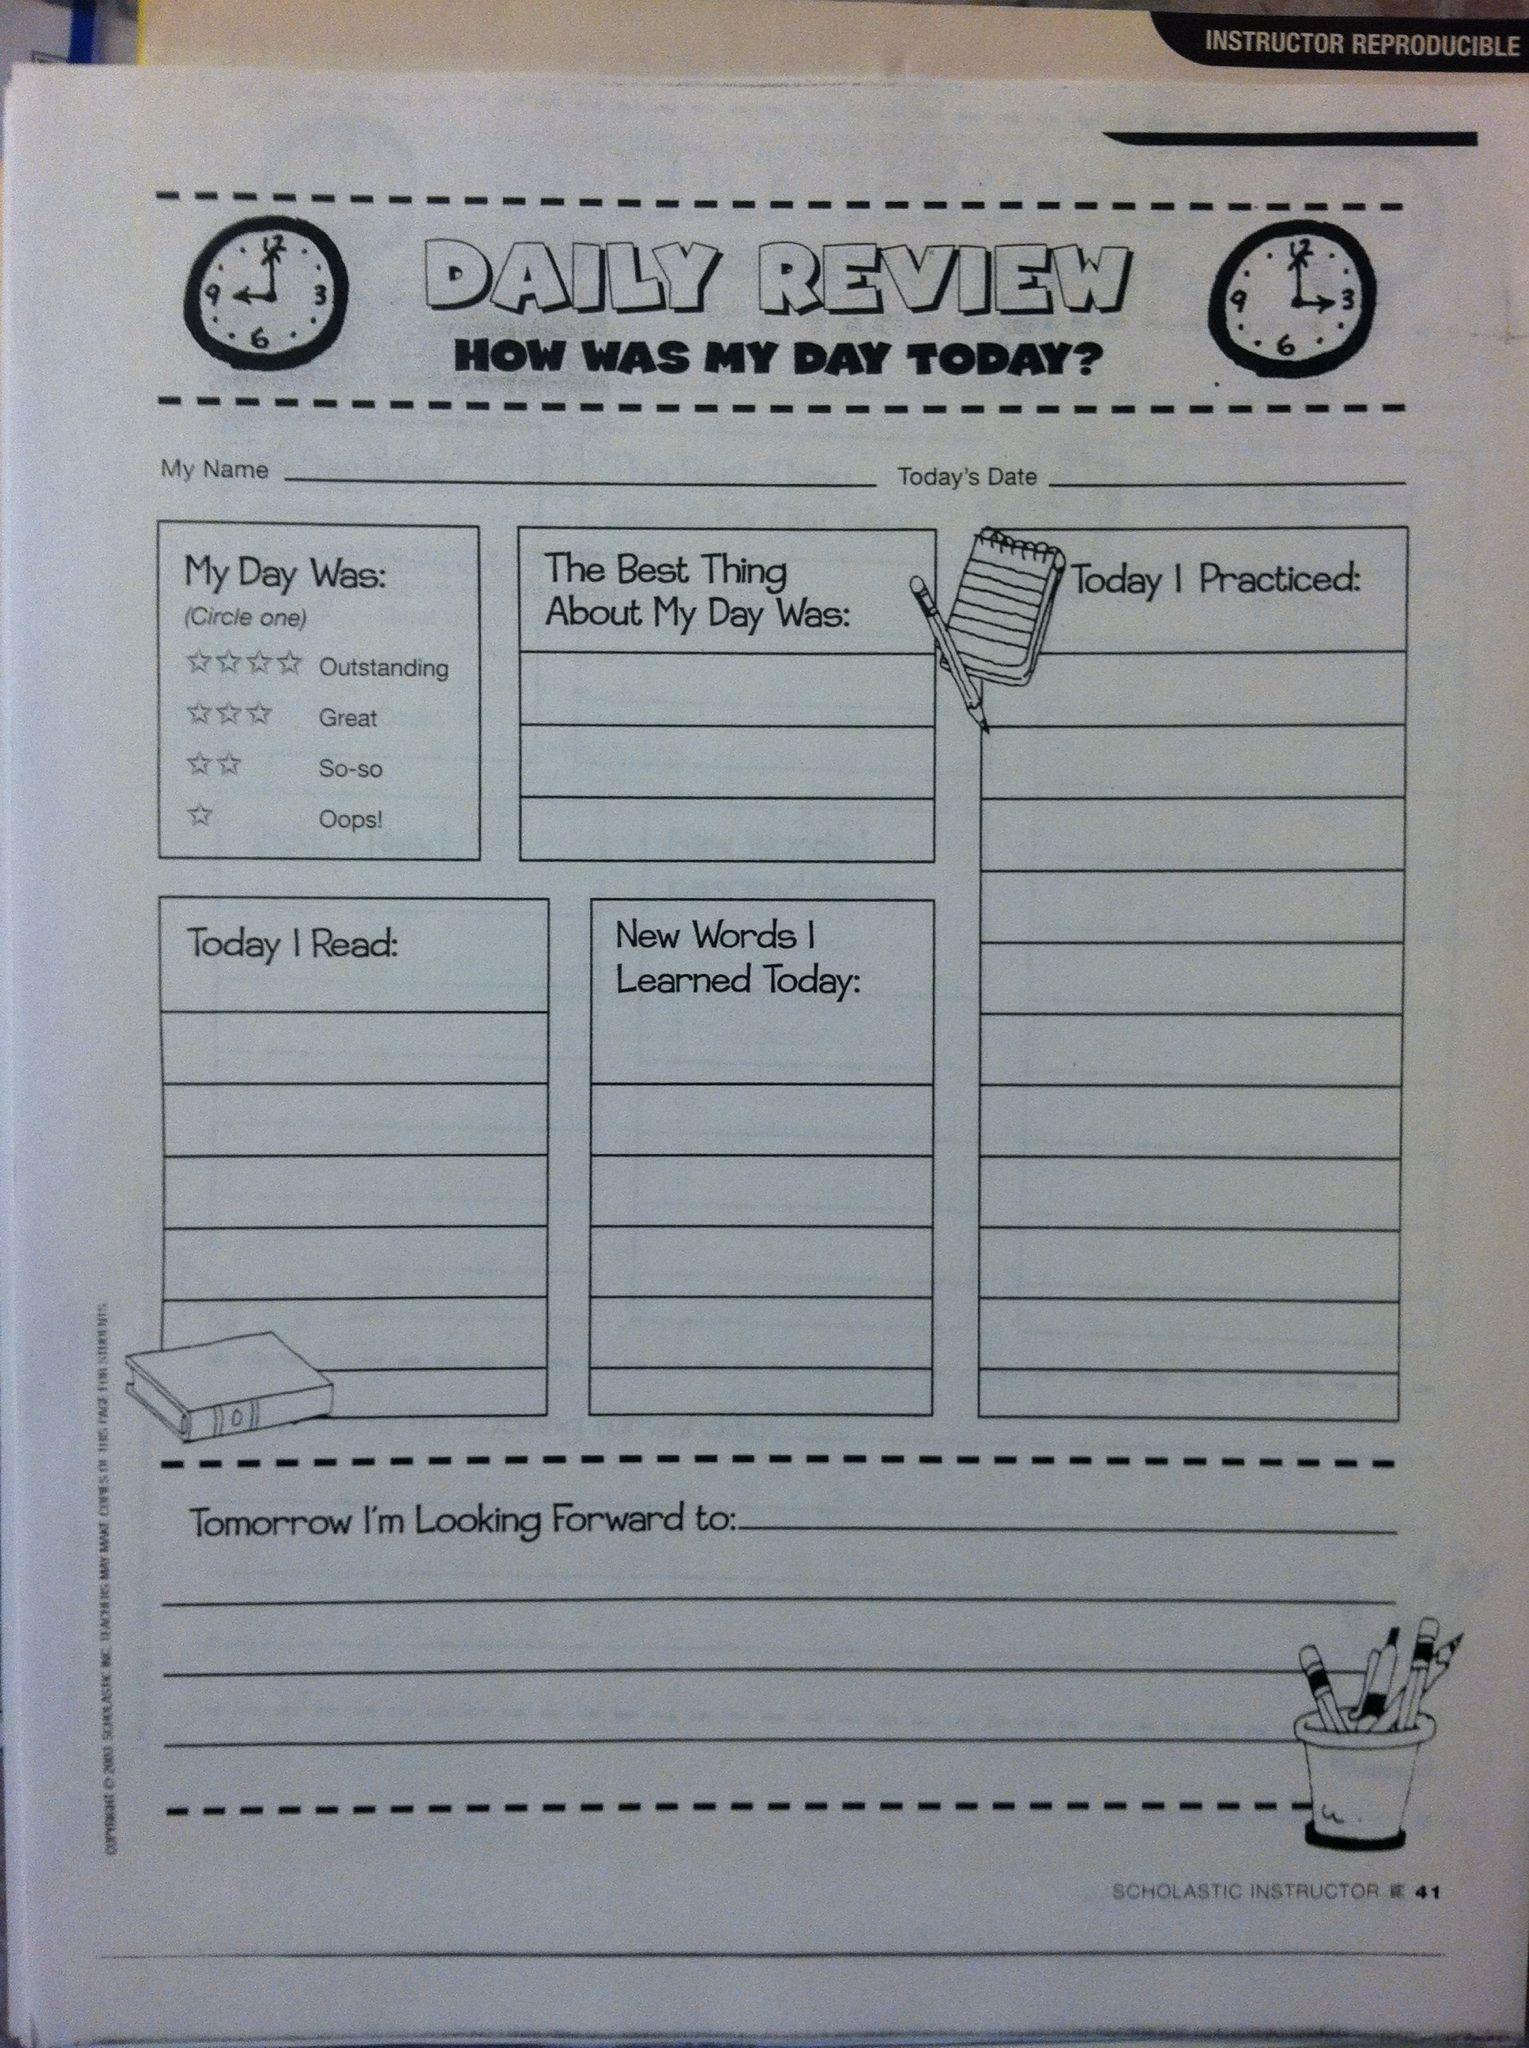 Homeschool Weekly Schedule Template  Daily Activity Schedule Form